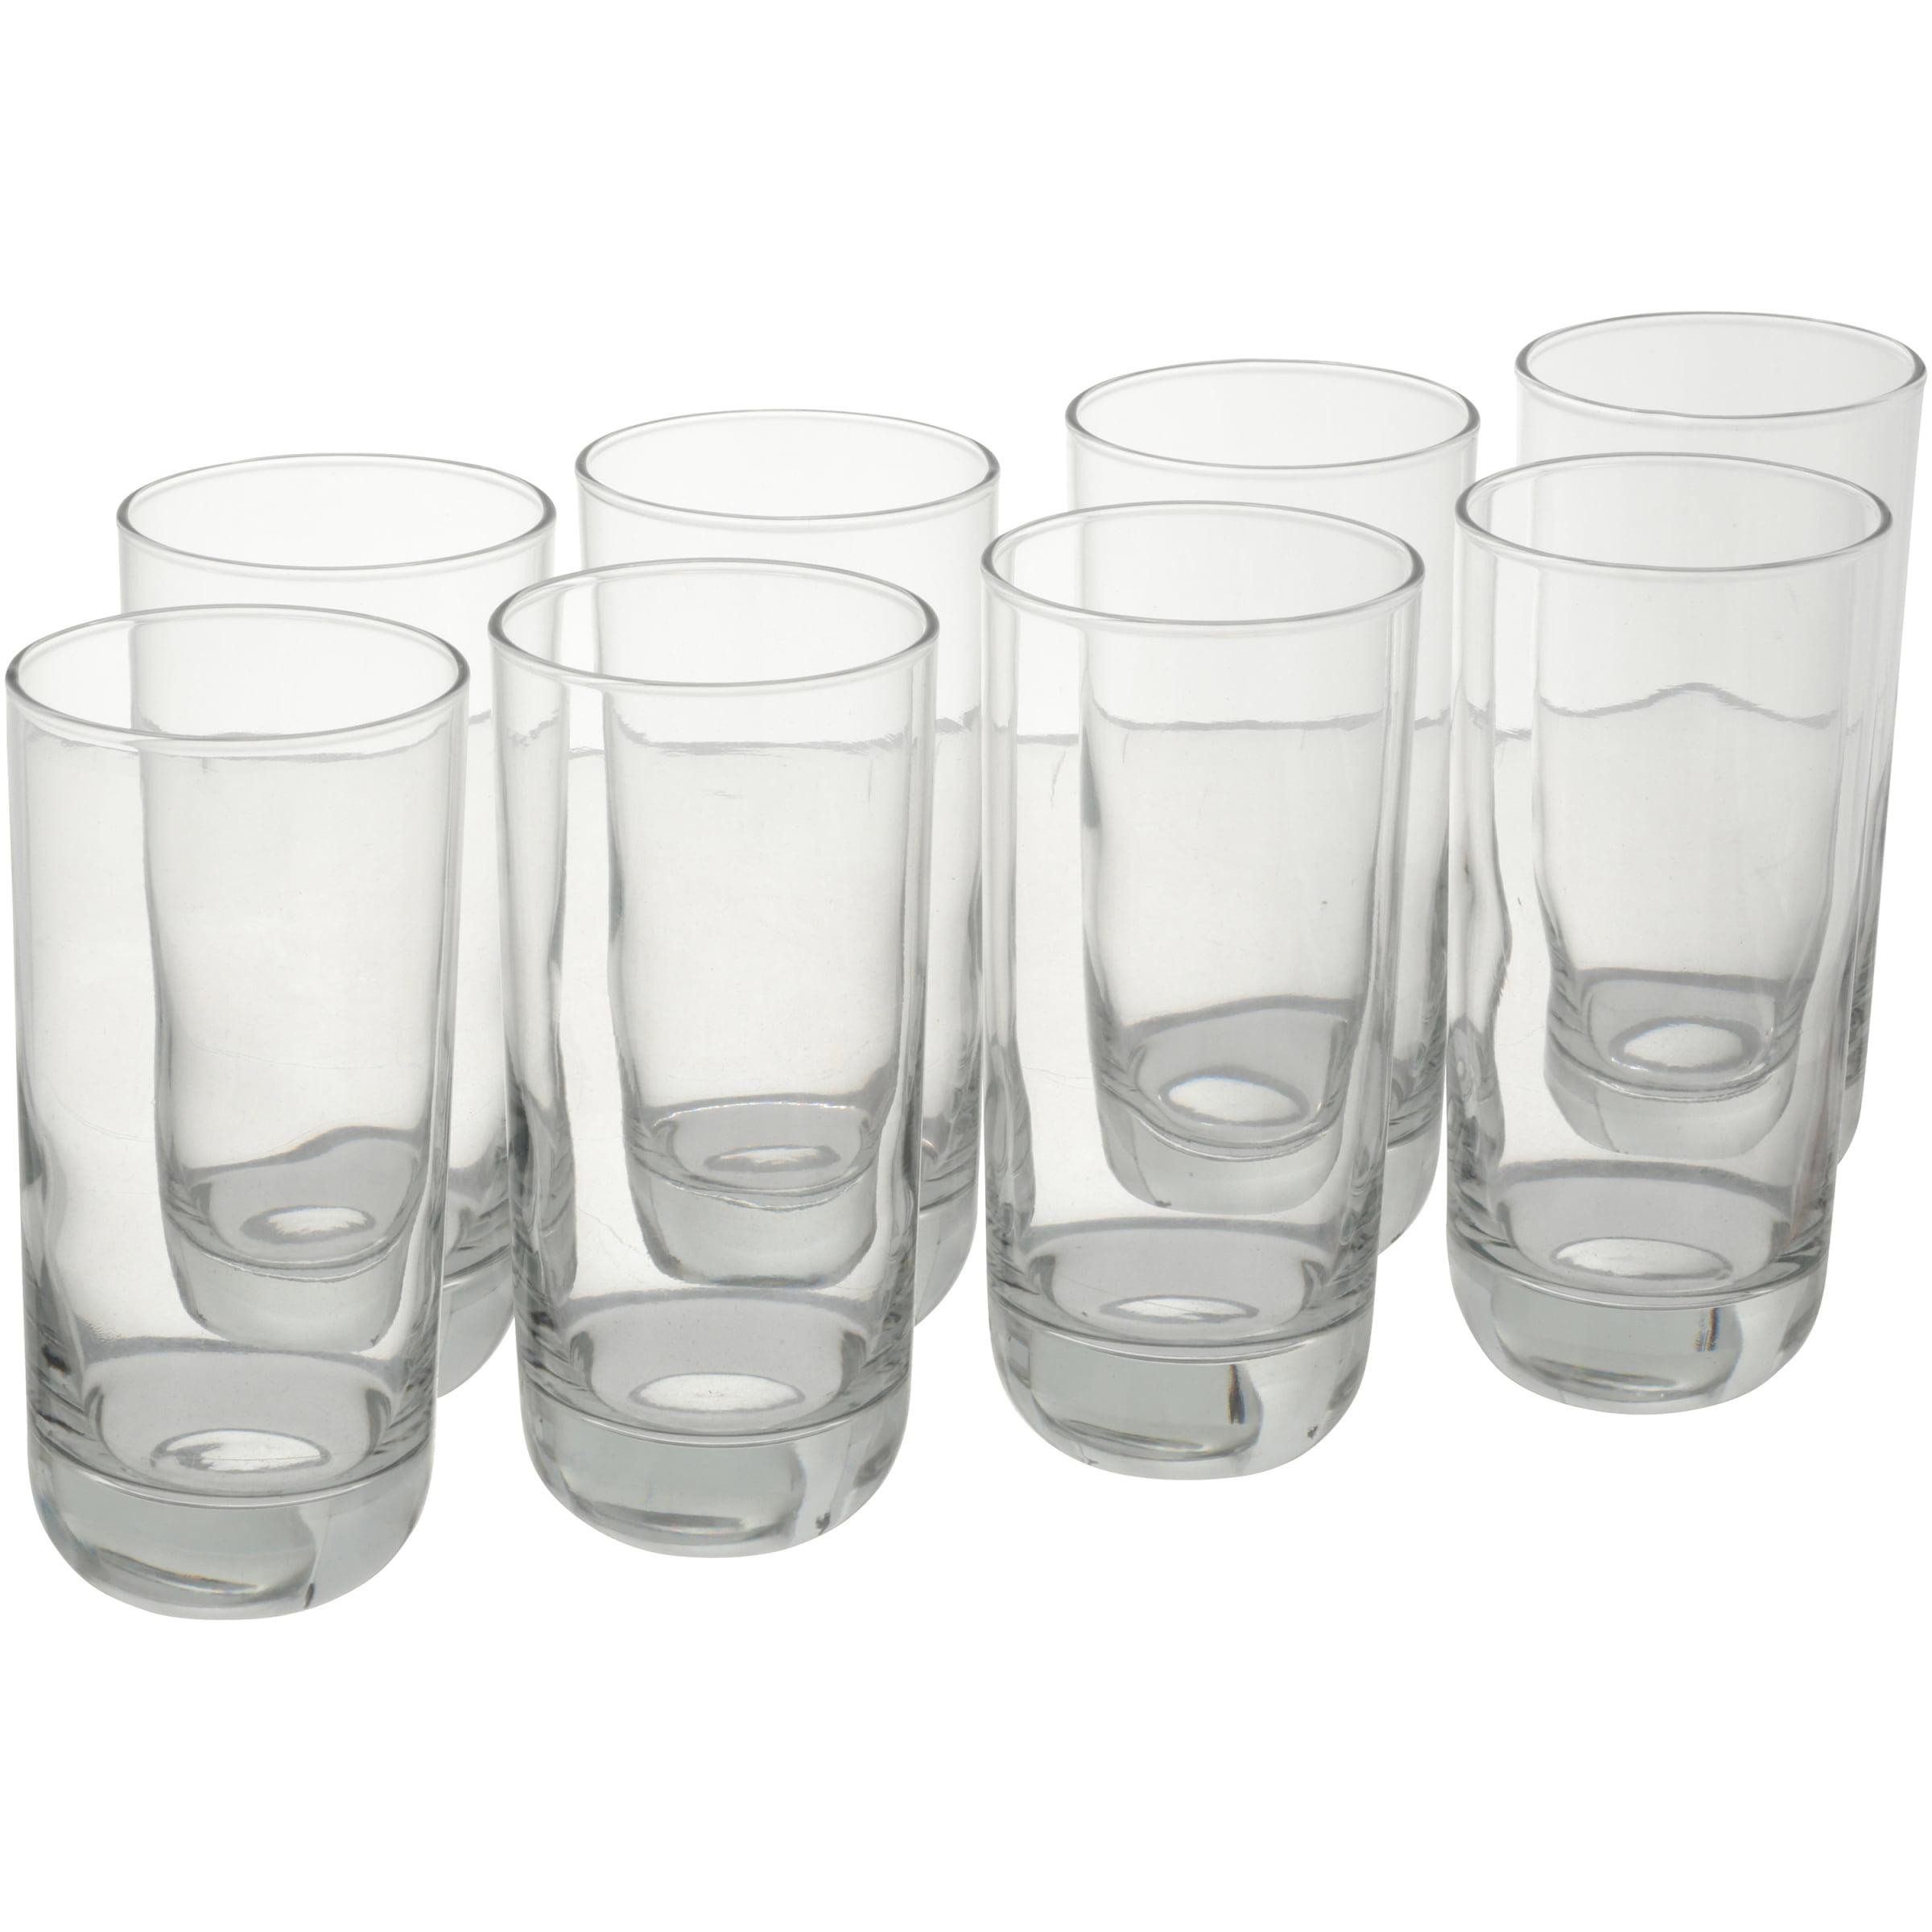 Libbey Polaris 16.25 oz. Clear Drinking Glasses 8 ct Box